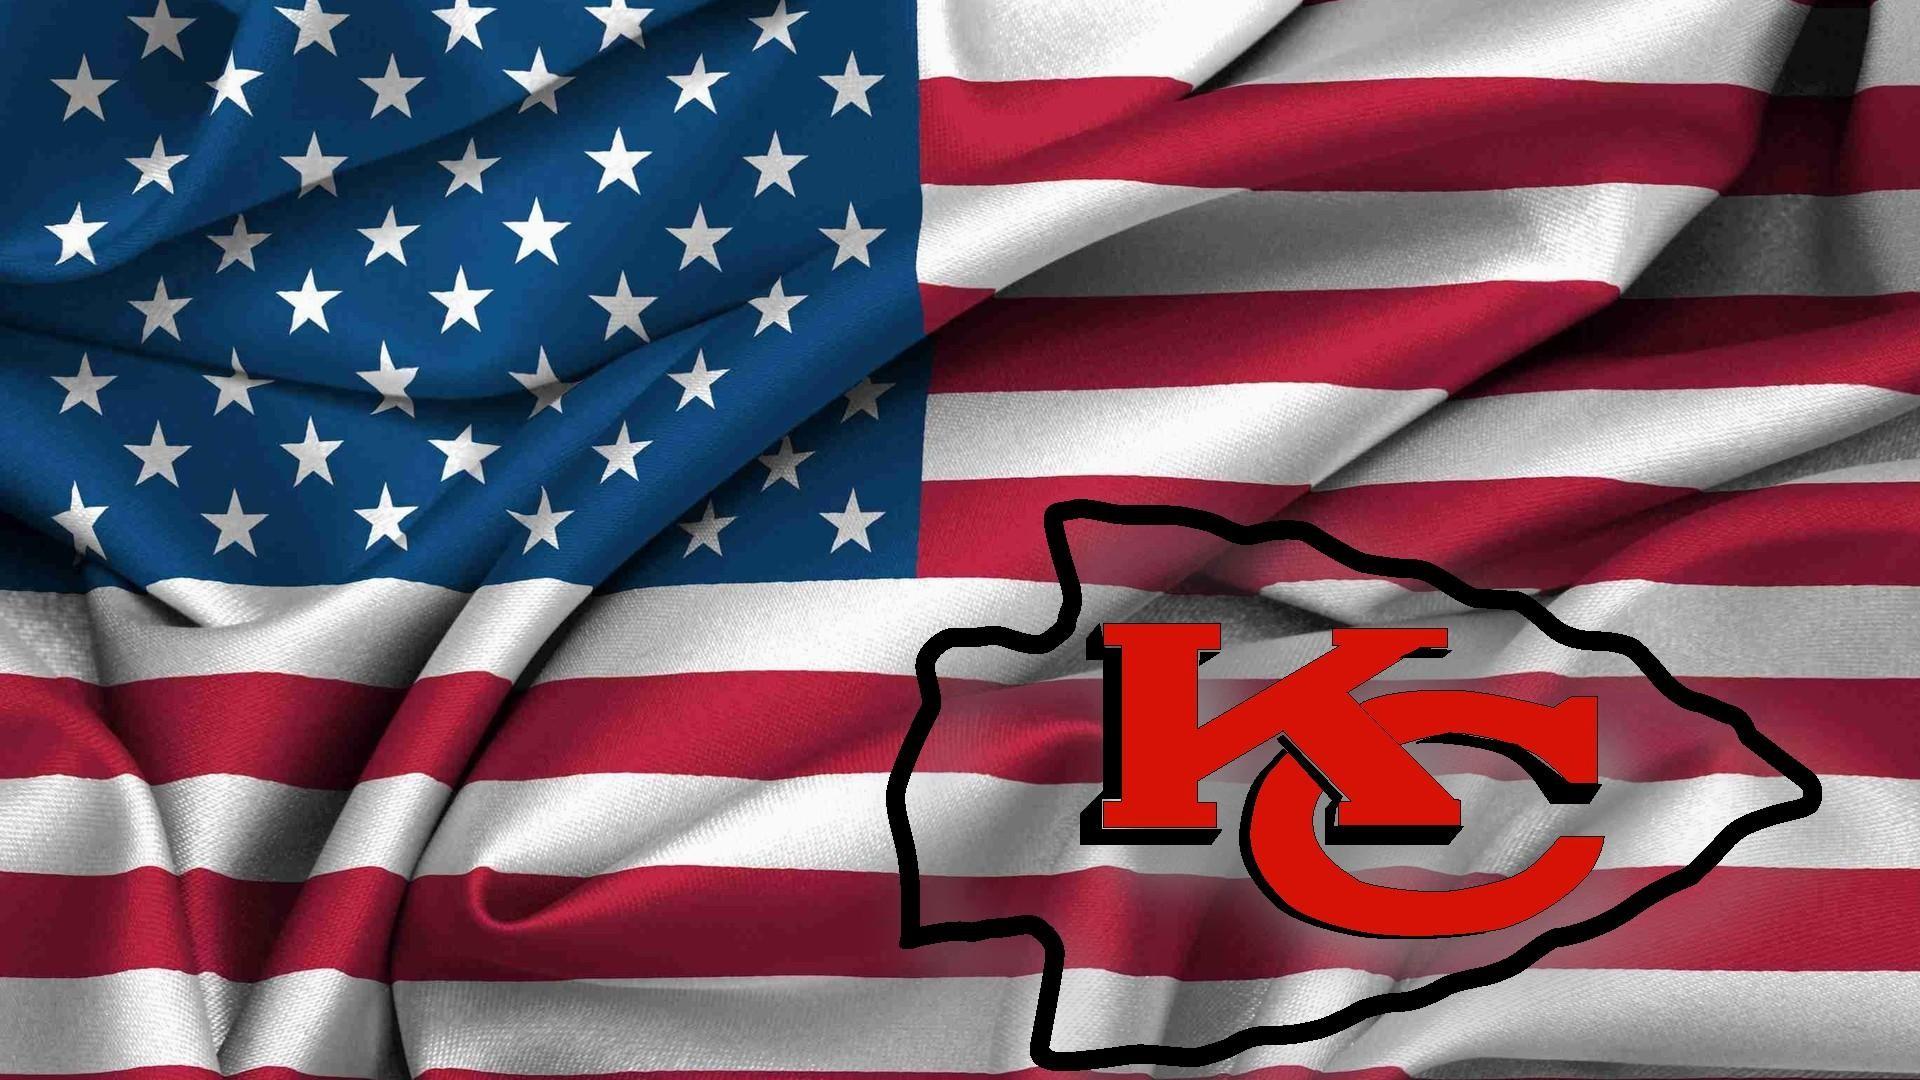 kansas-city-chiefs-logo-Kansas-City-Chiefs-Logo-